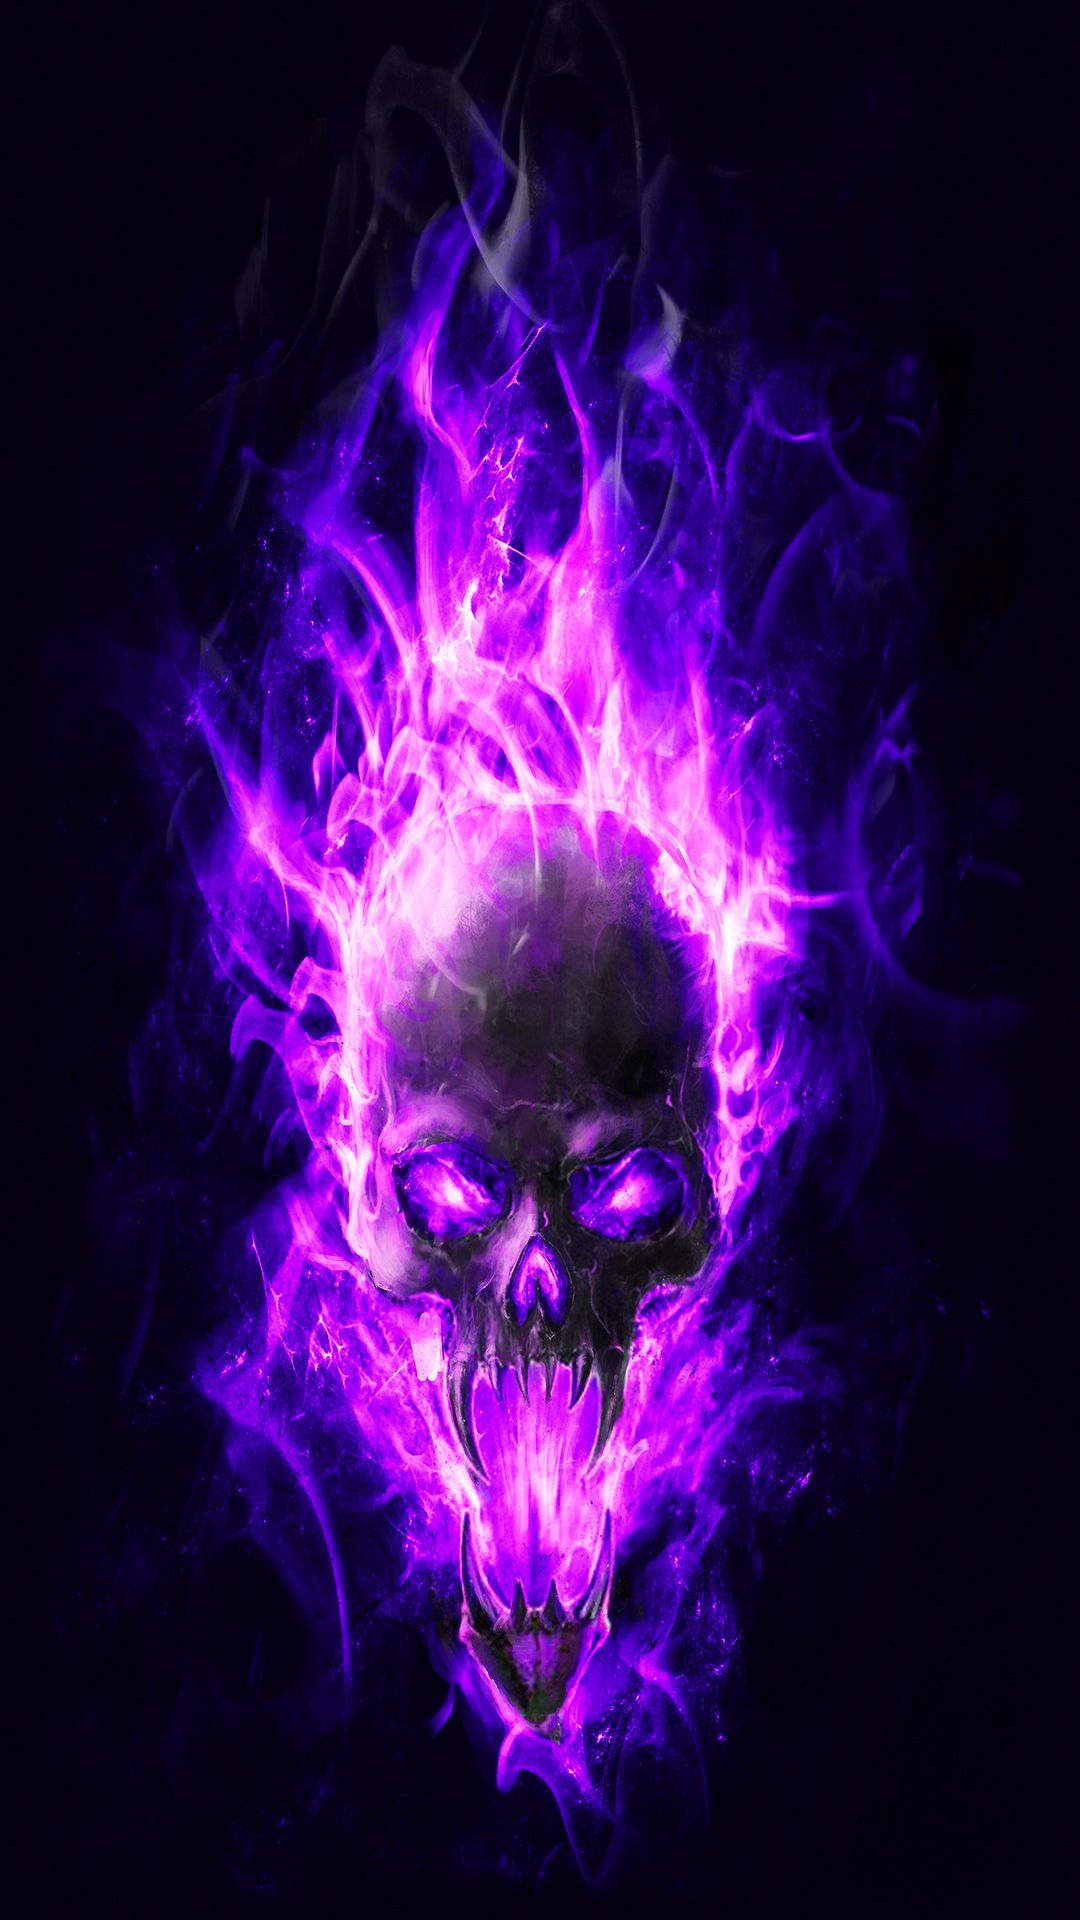 Image Result For Flaming Skulls Blue Skull Wallpaper Skull Artwork Skull Pictures